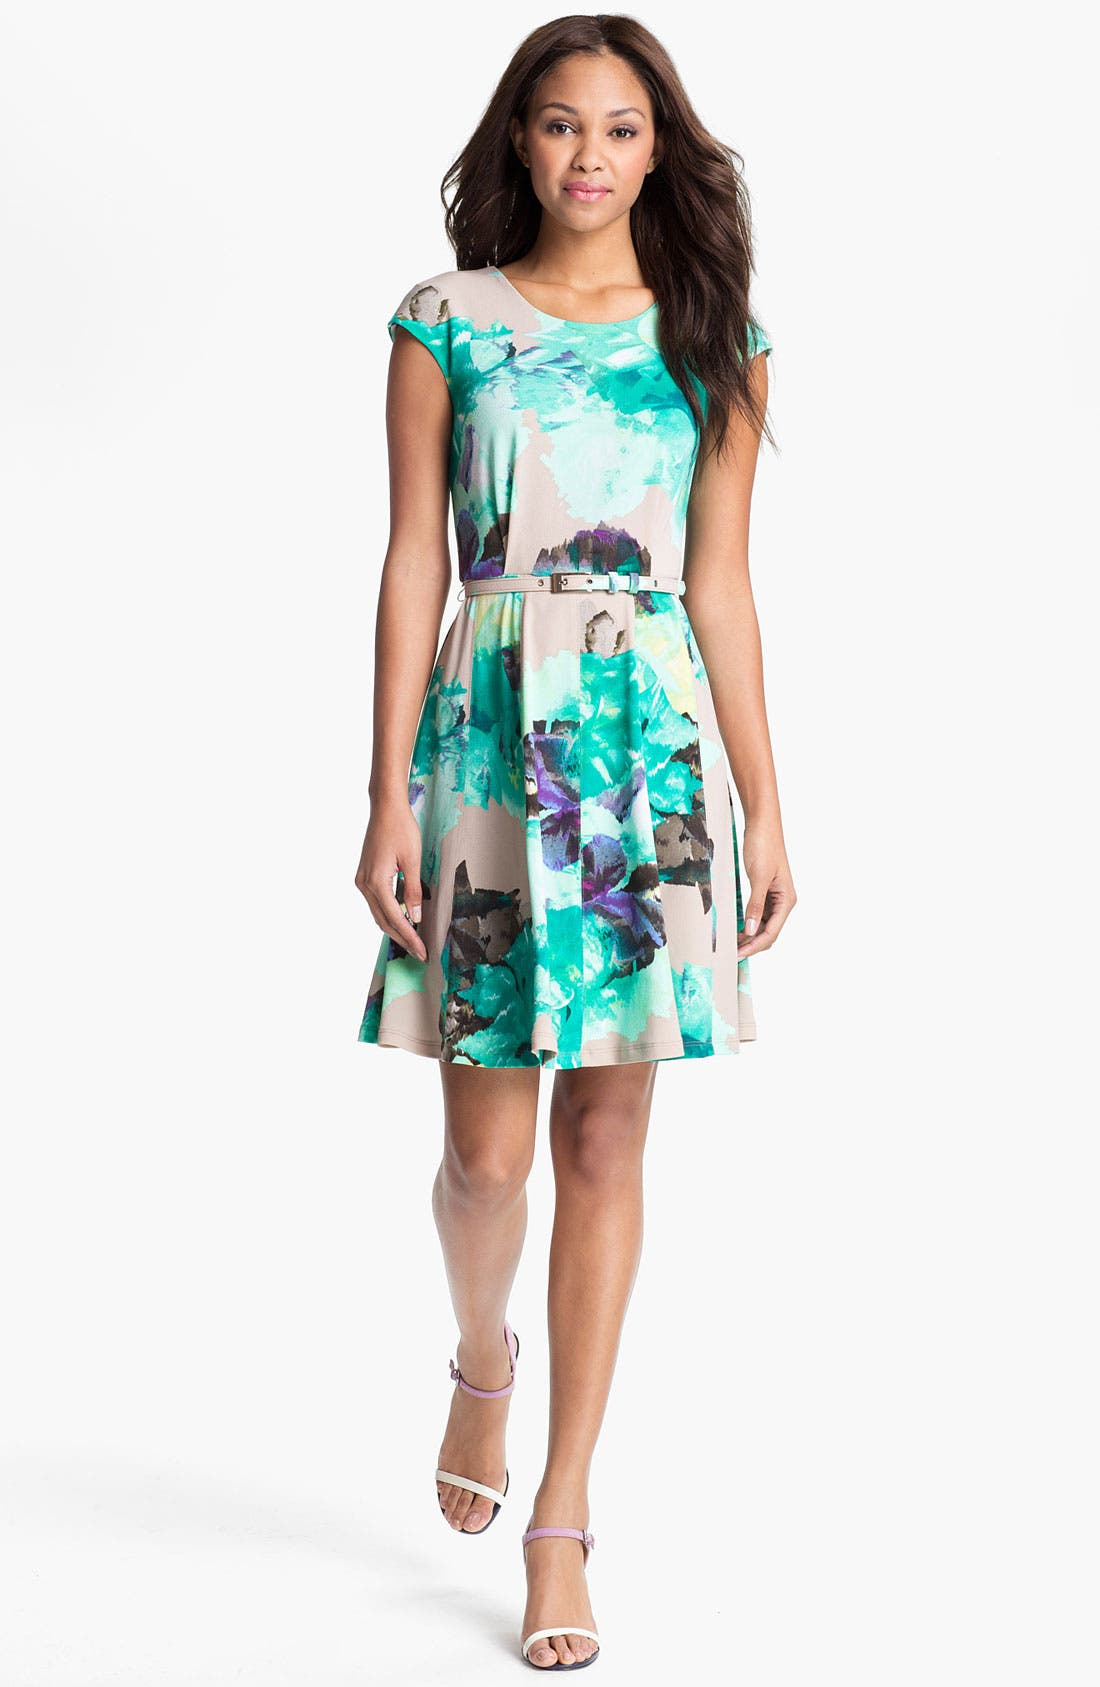 Alternate Image 1 Selected - Alex & Ava Print Fit & Flare Dress